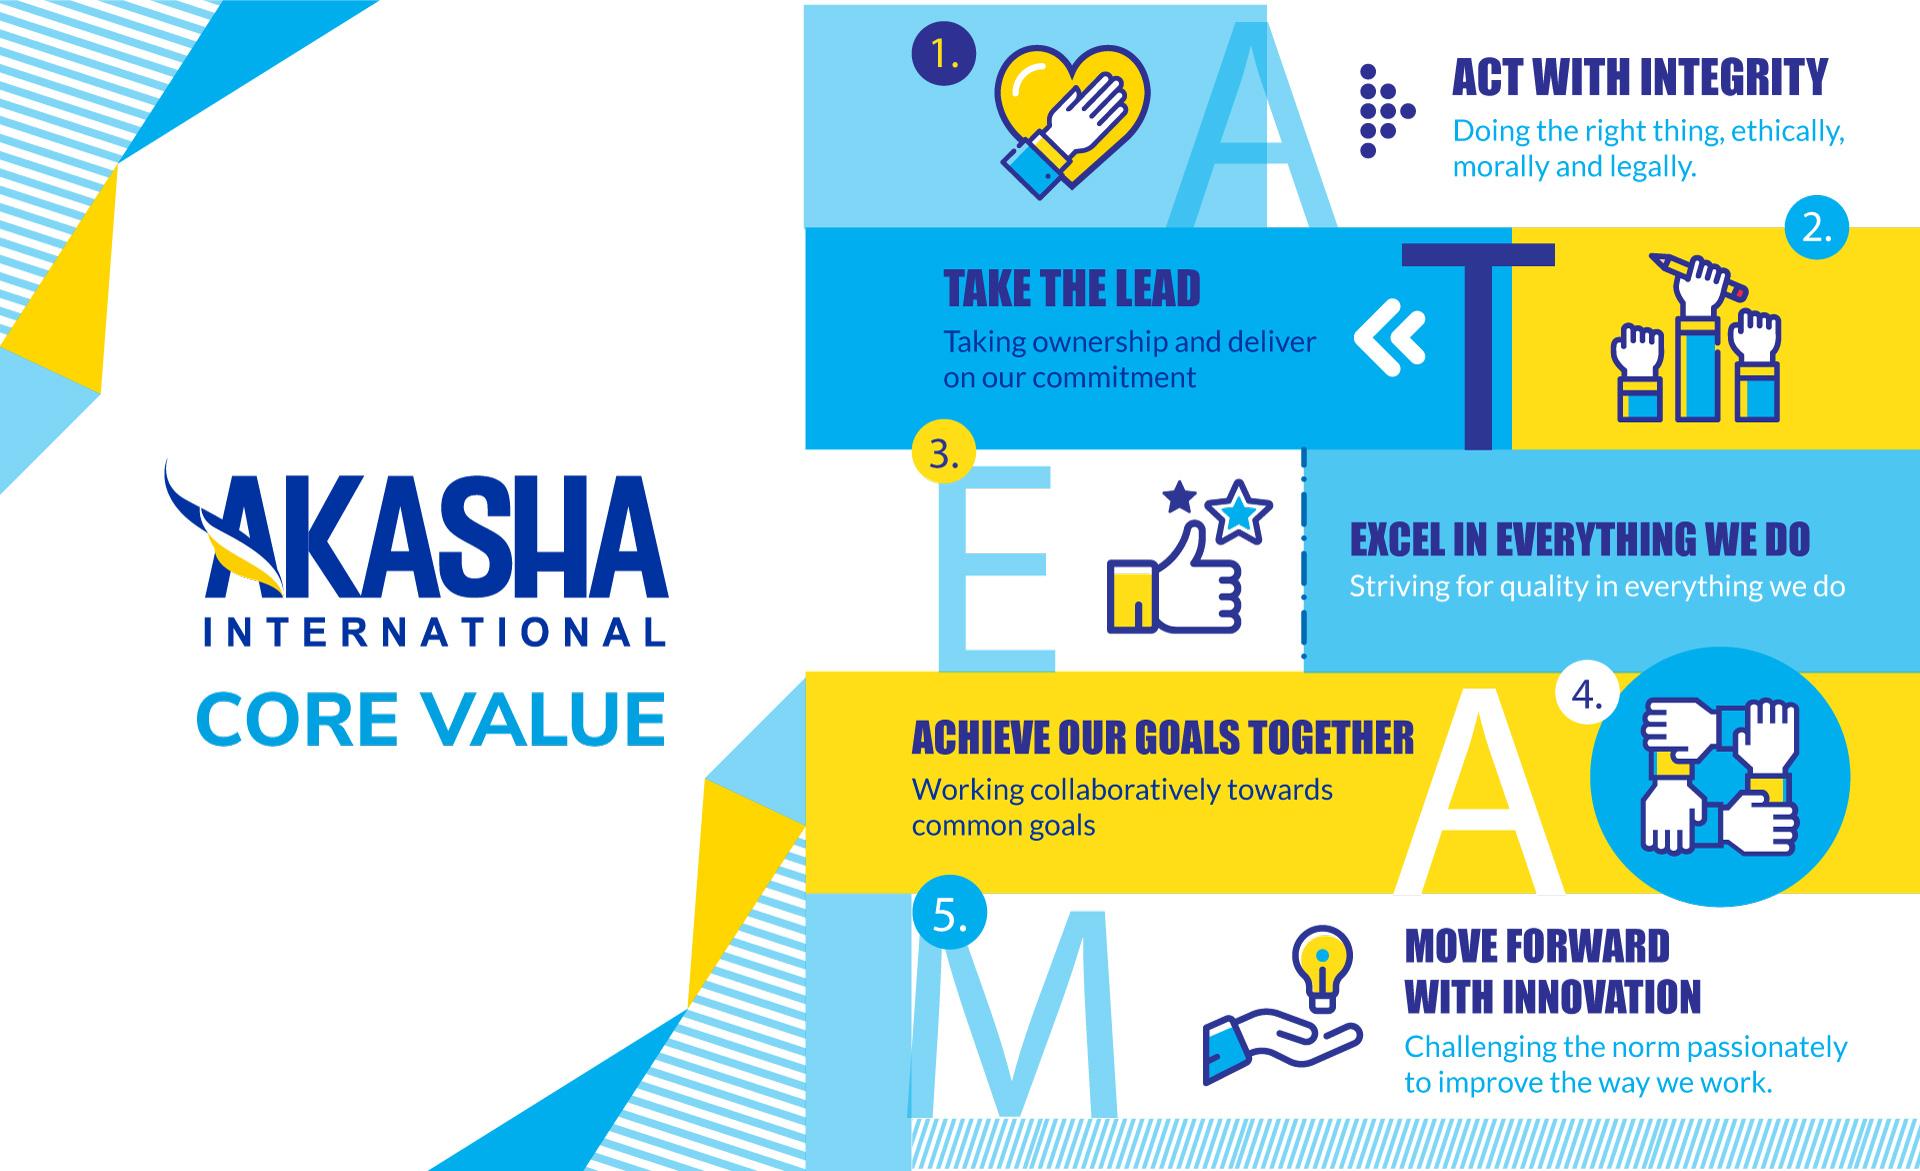 Akasha Core Value